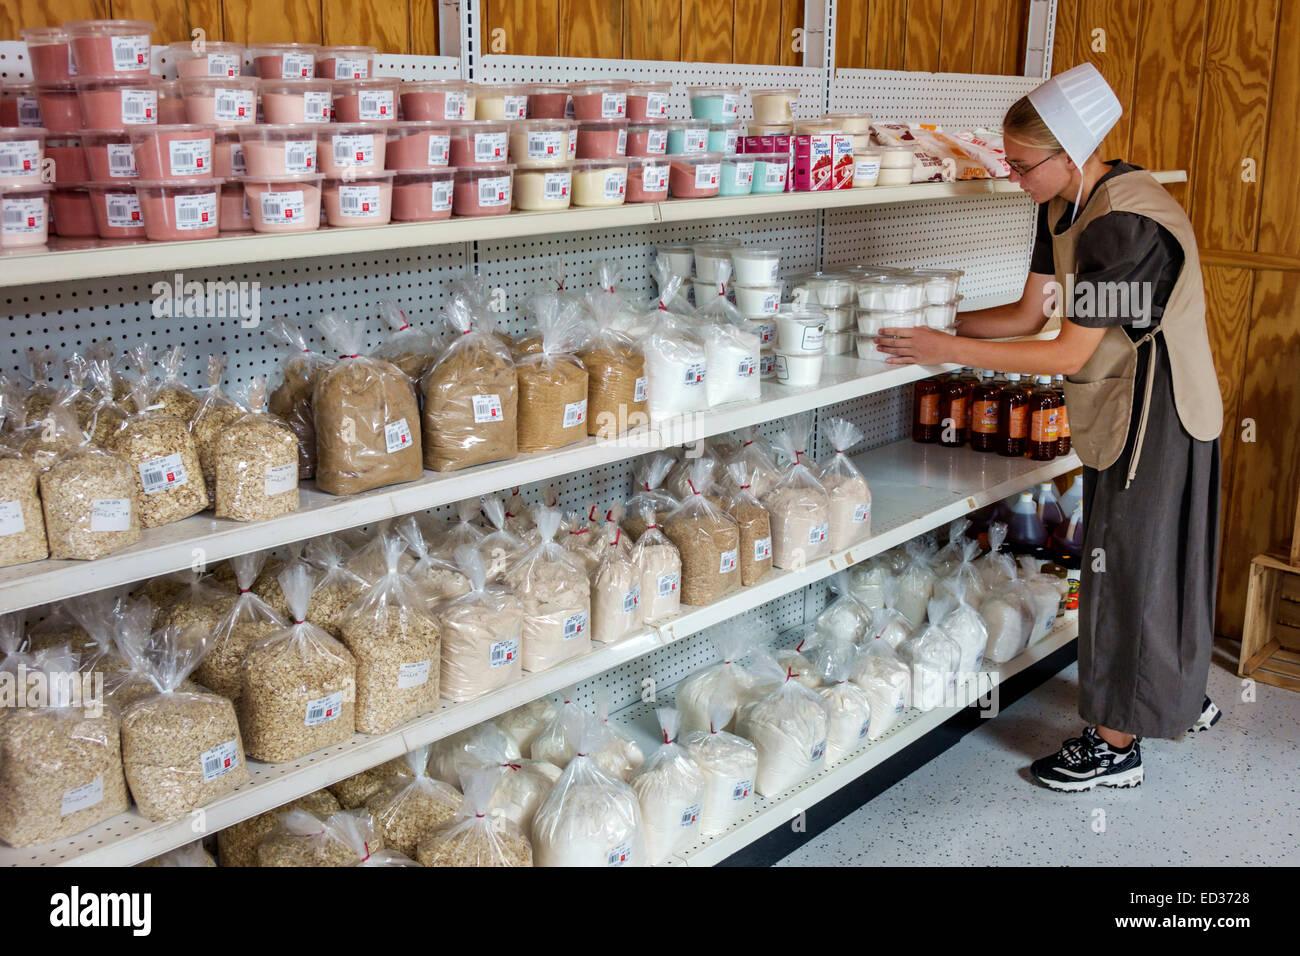 Illinois Arthur Shady Crest Orchard & and Farm Market woman Amish cap bonnet employee job working stocking shelves - Stock Image